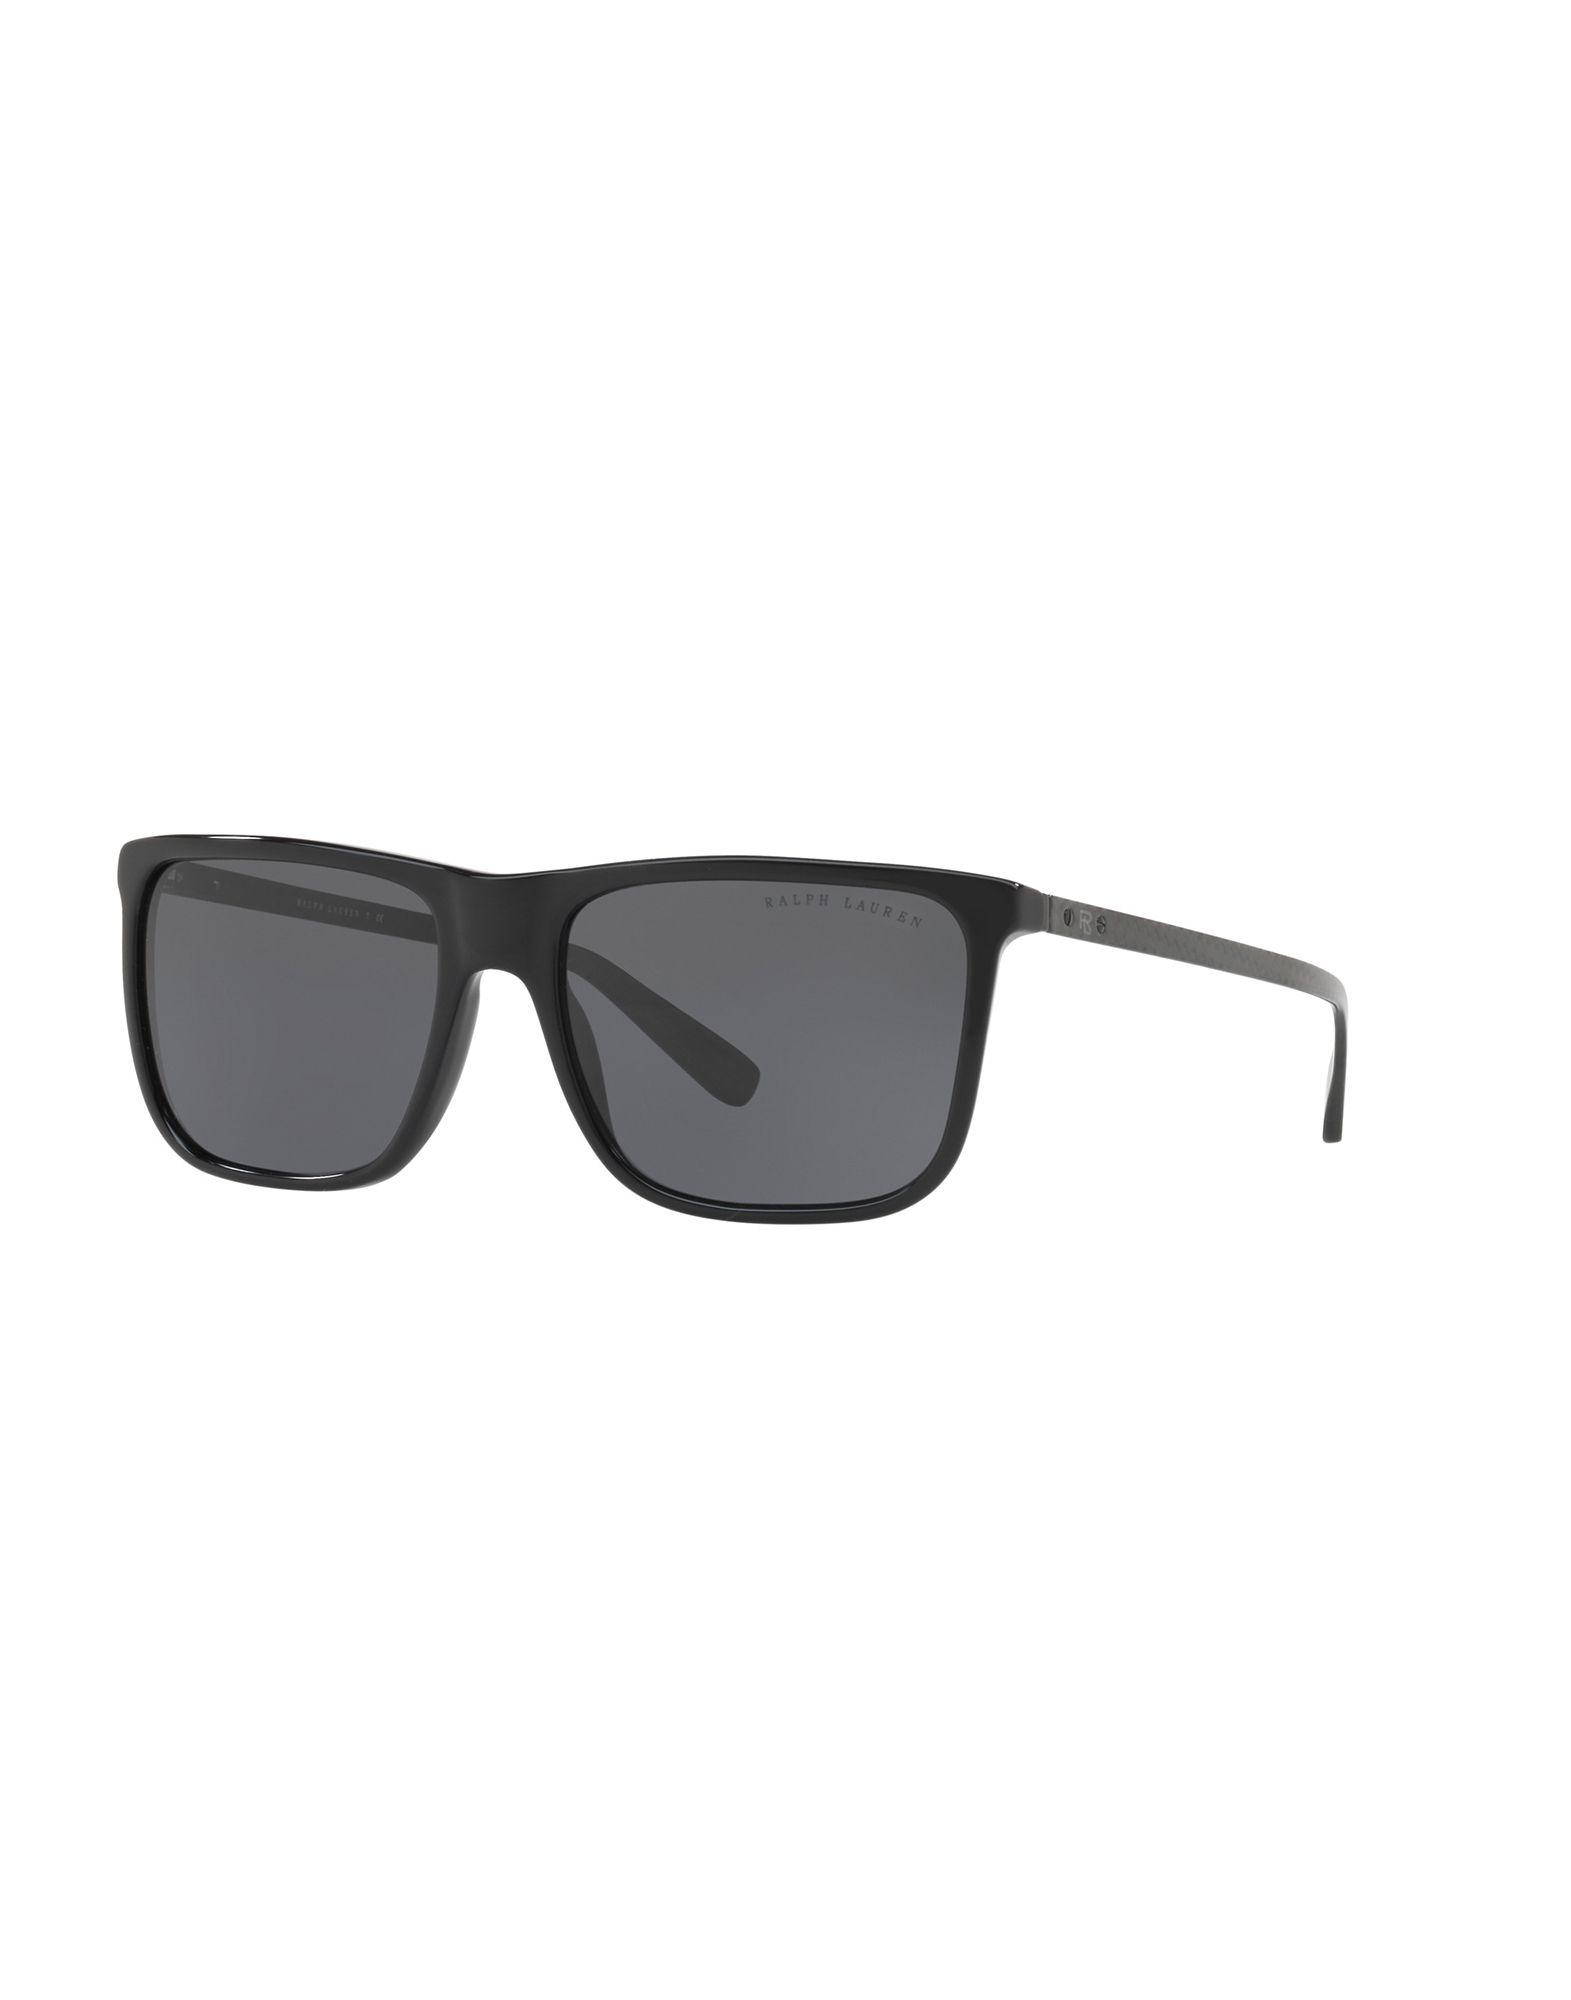 Occhiali Da Sole Ralph Lauren Rl8157 - Uomo - Acquista online su